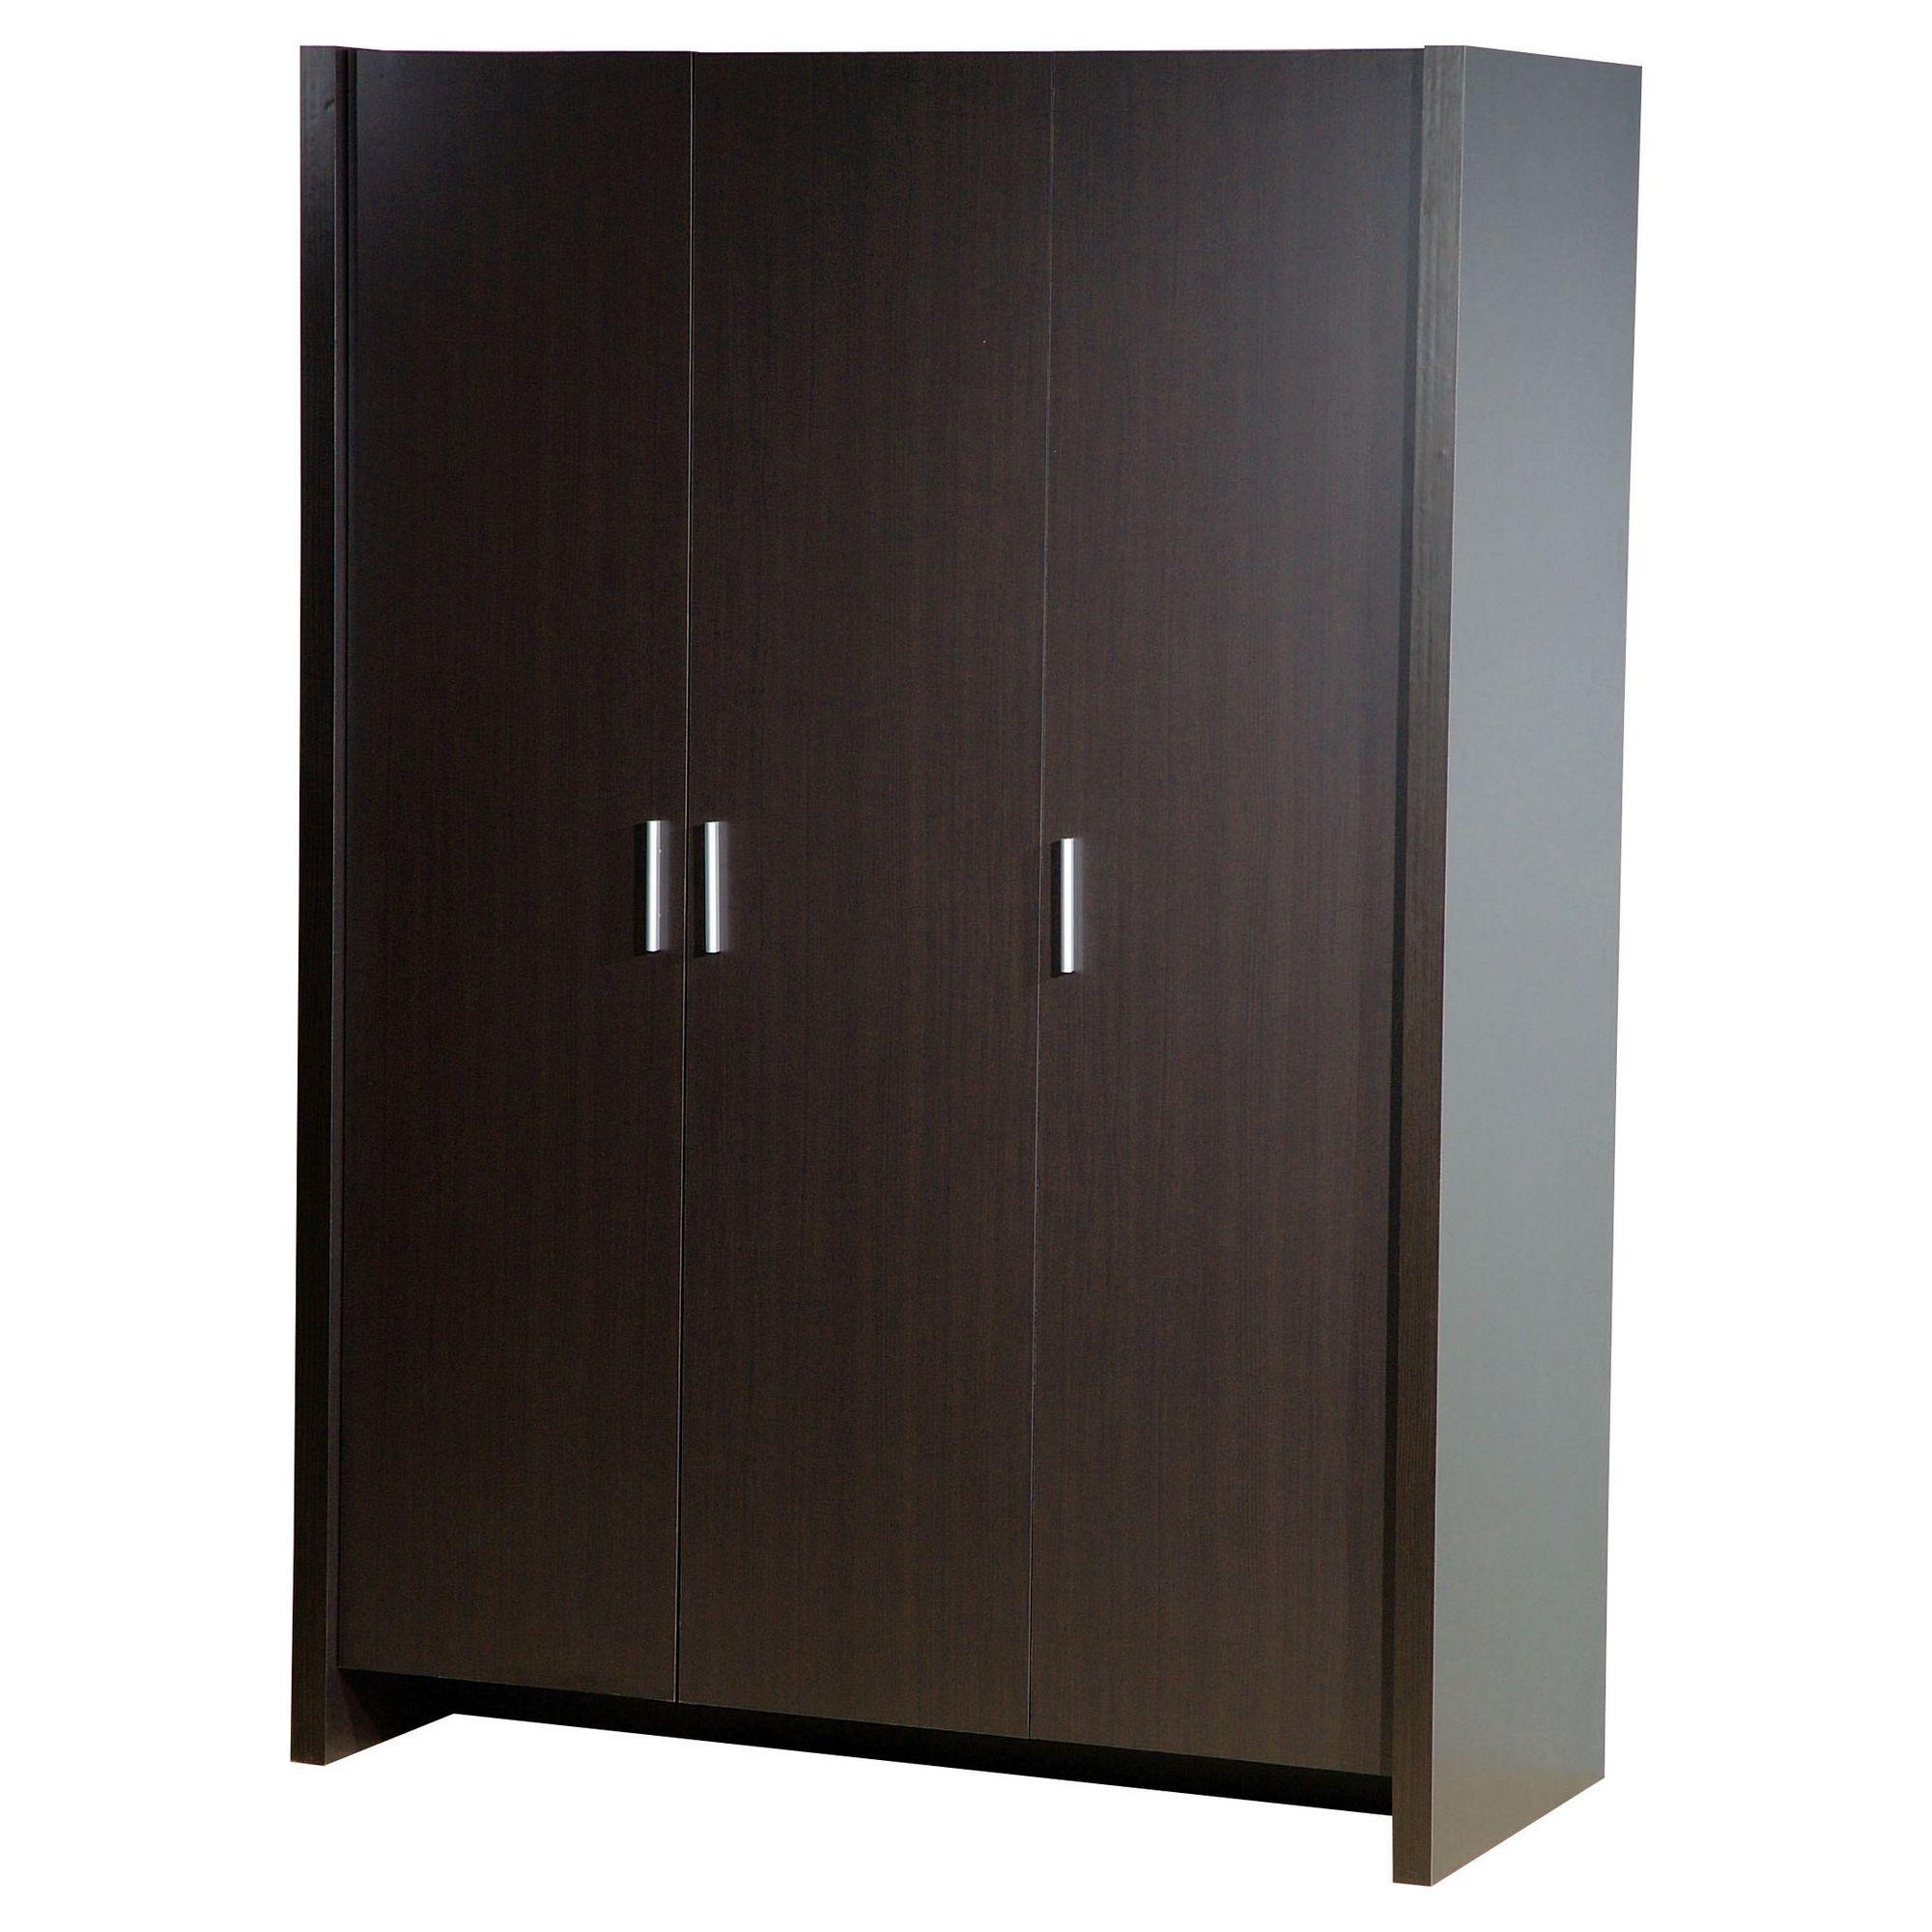 Home Essence Braemar Three Door Wardrobe in Espresso Brown at Tesco Direct